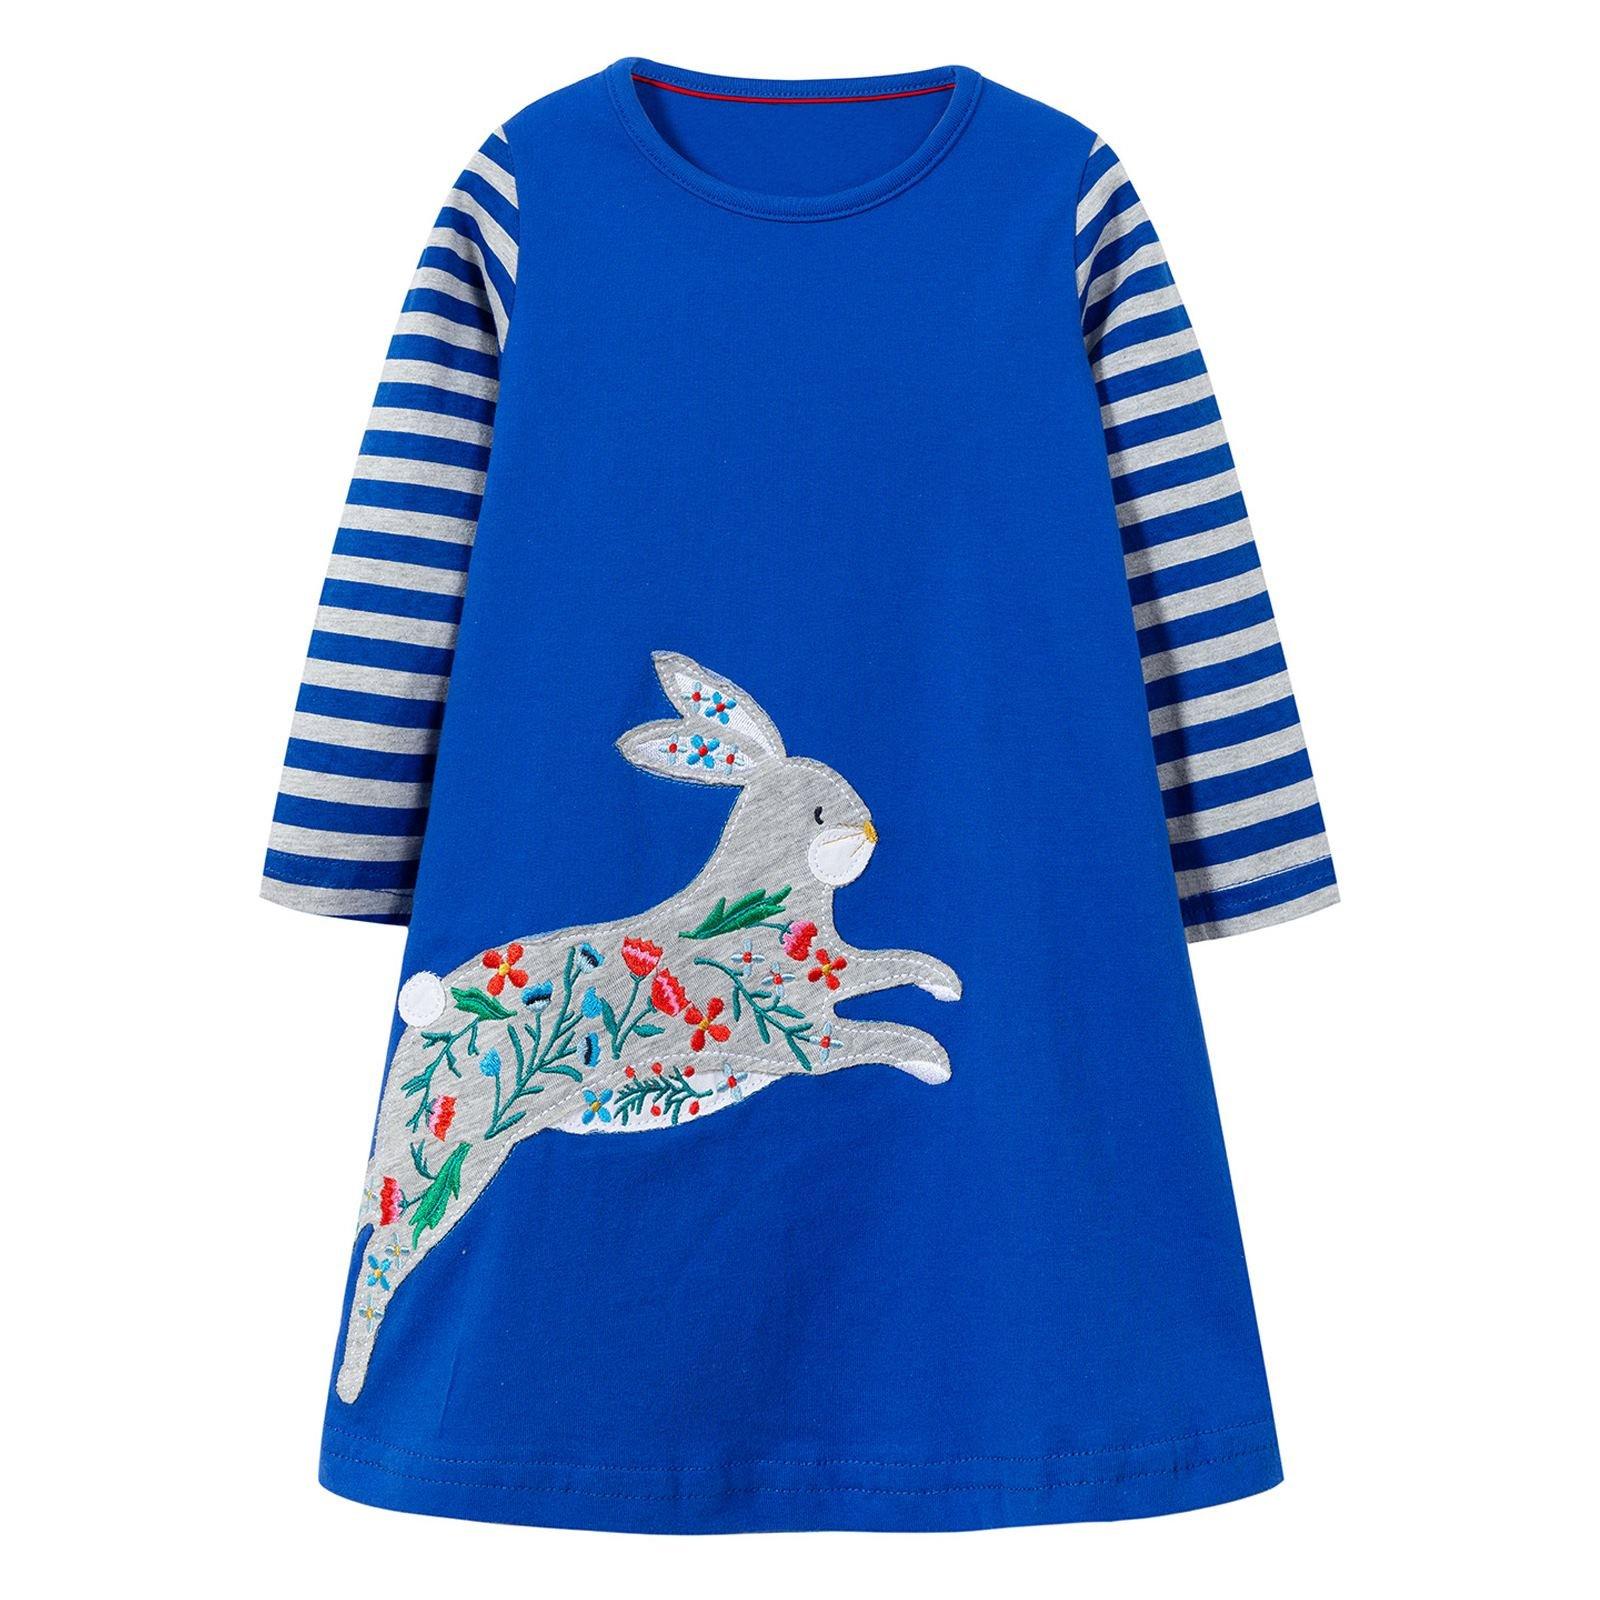 VIKITA Toddler Girl Bunny Loose Blue Long Sleeve Dress Baby Girls Winter Casual Dresses 1-8 Years JM7665, 2T